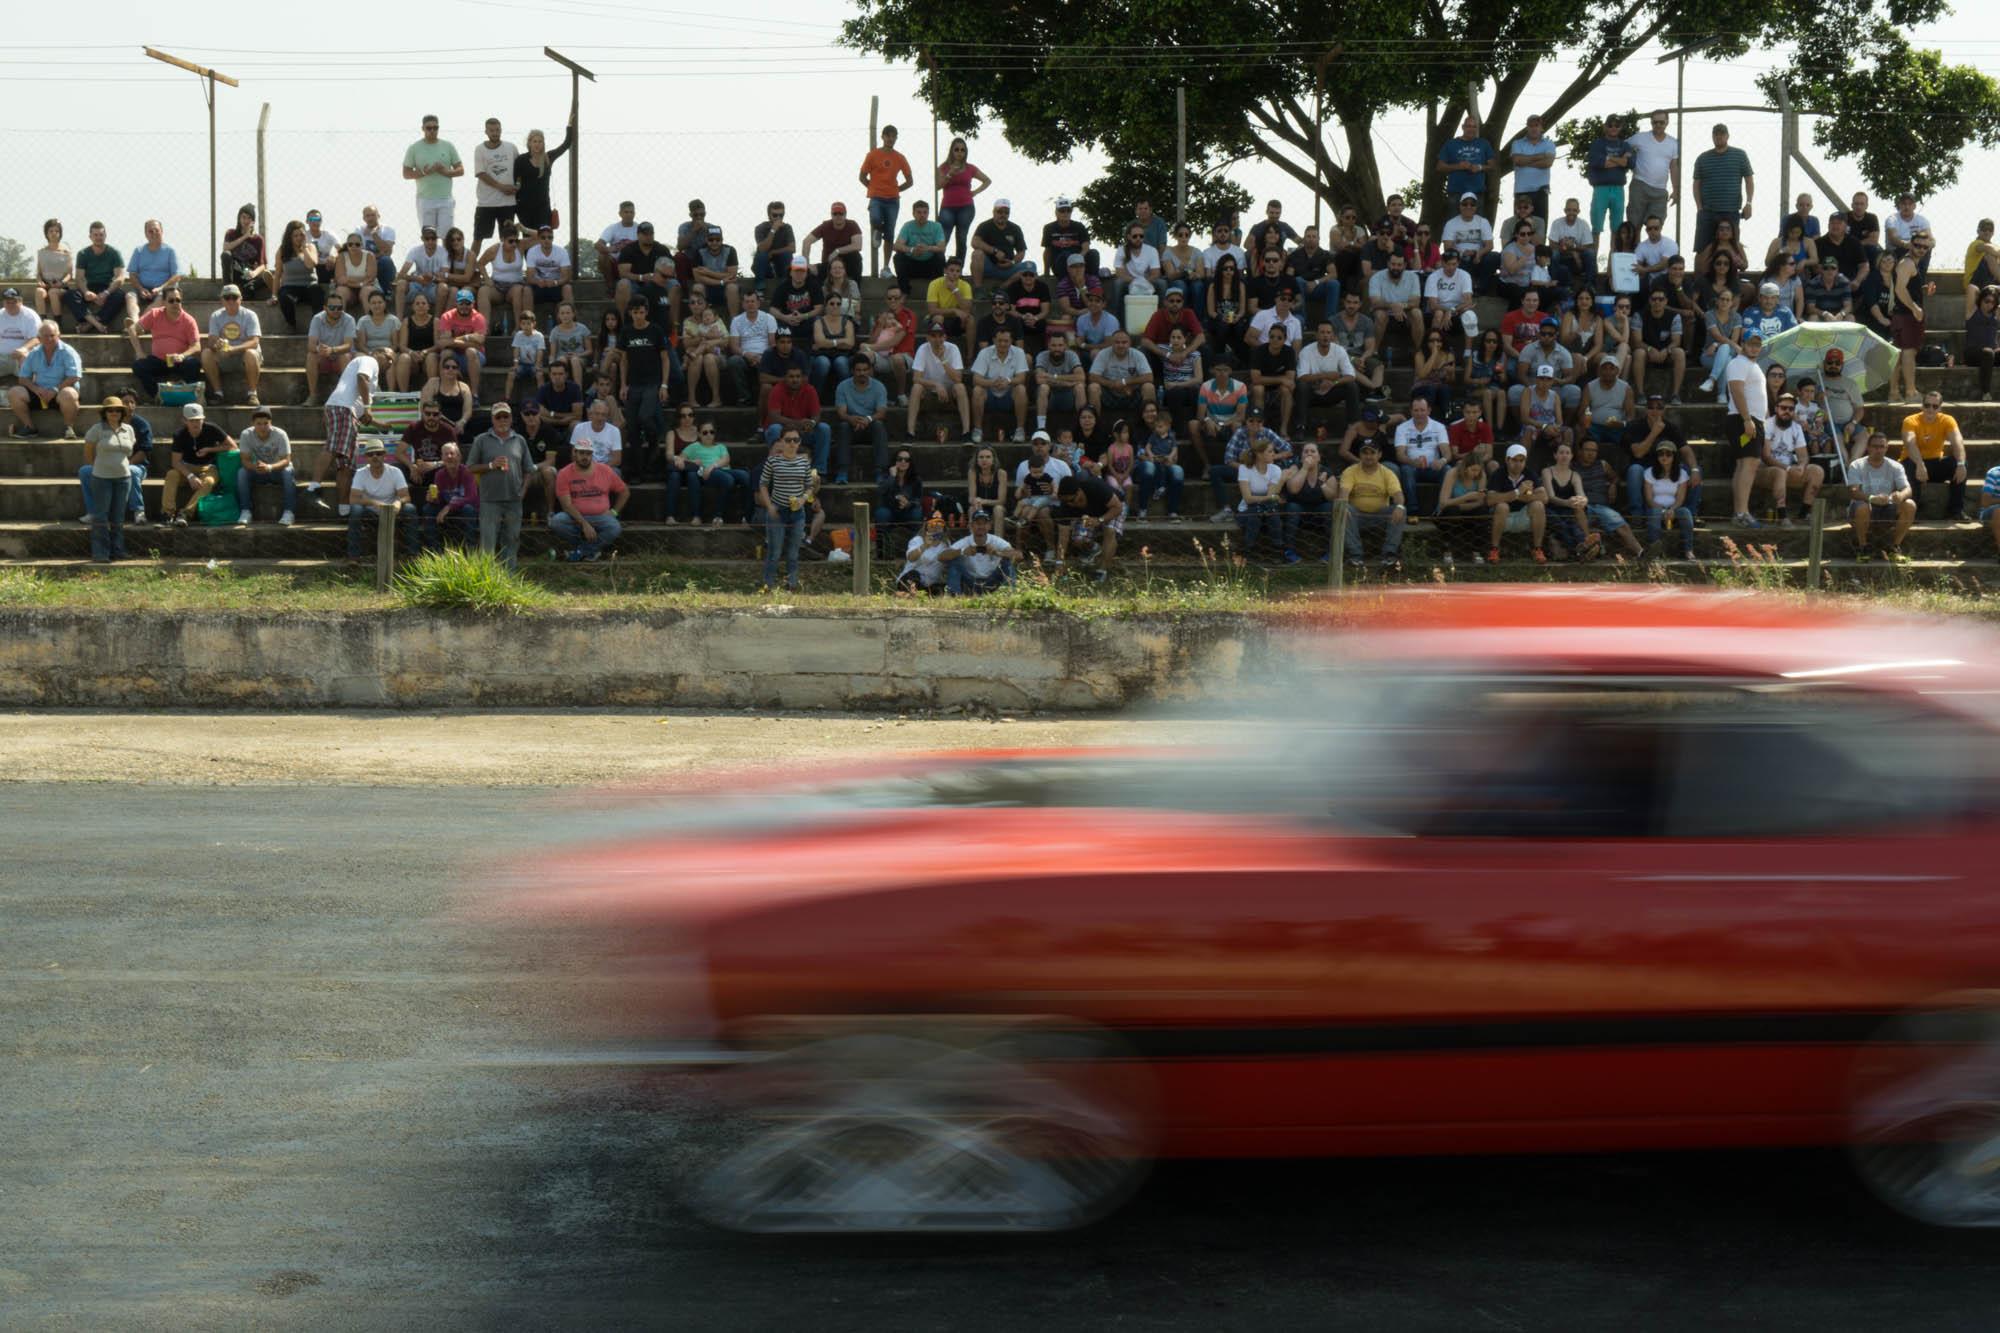 Car Speeding Down Track